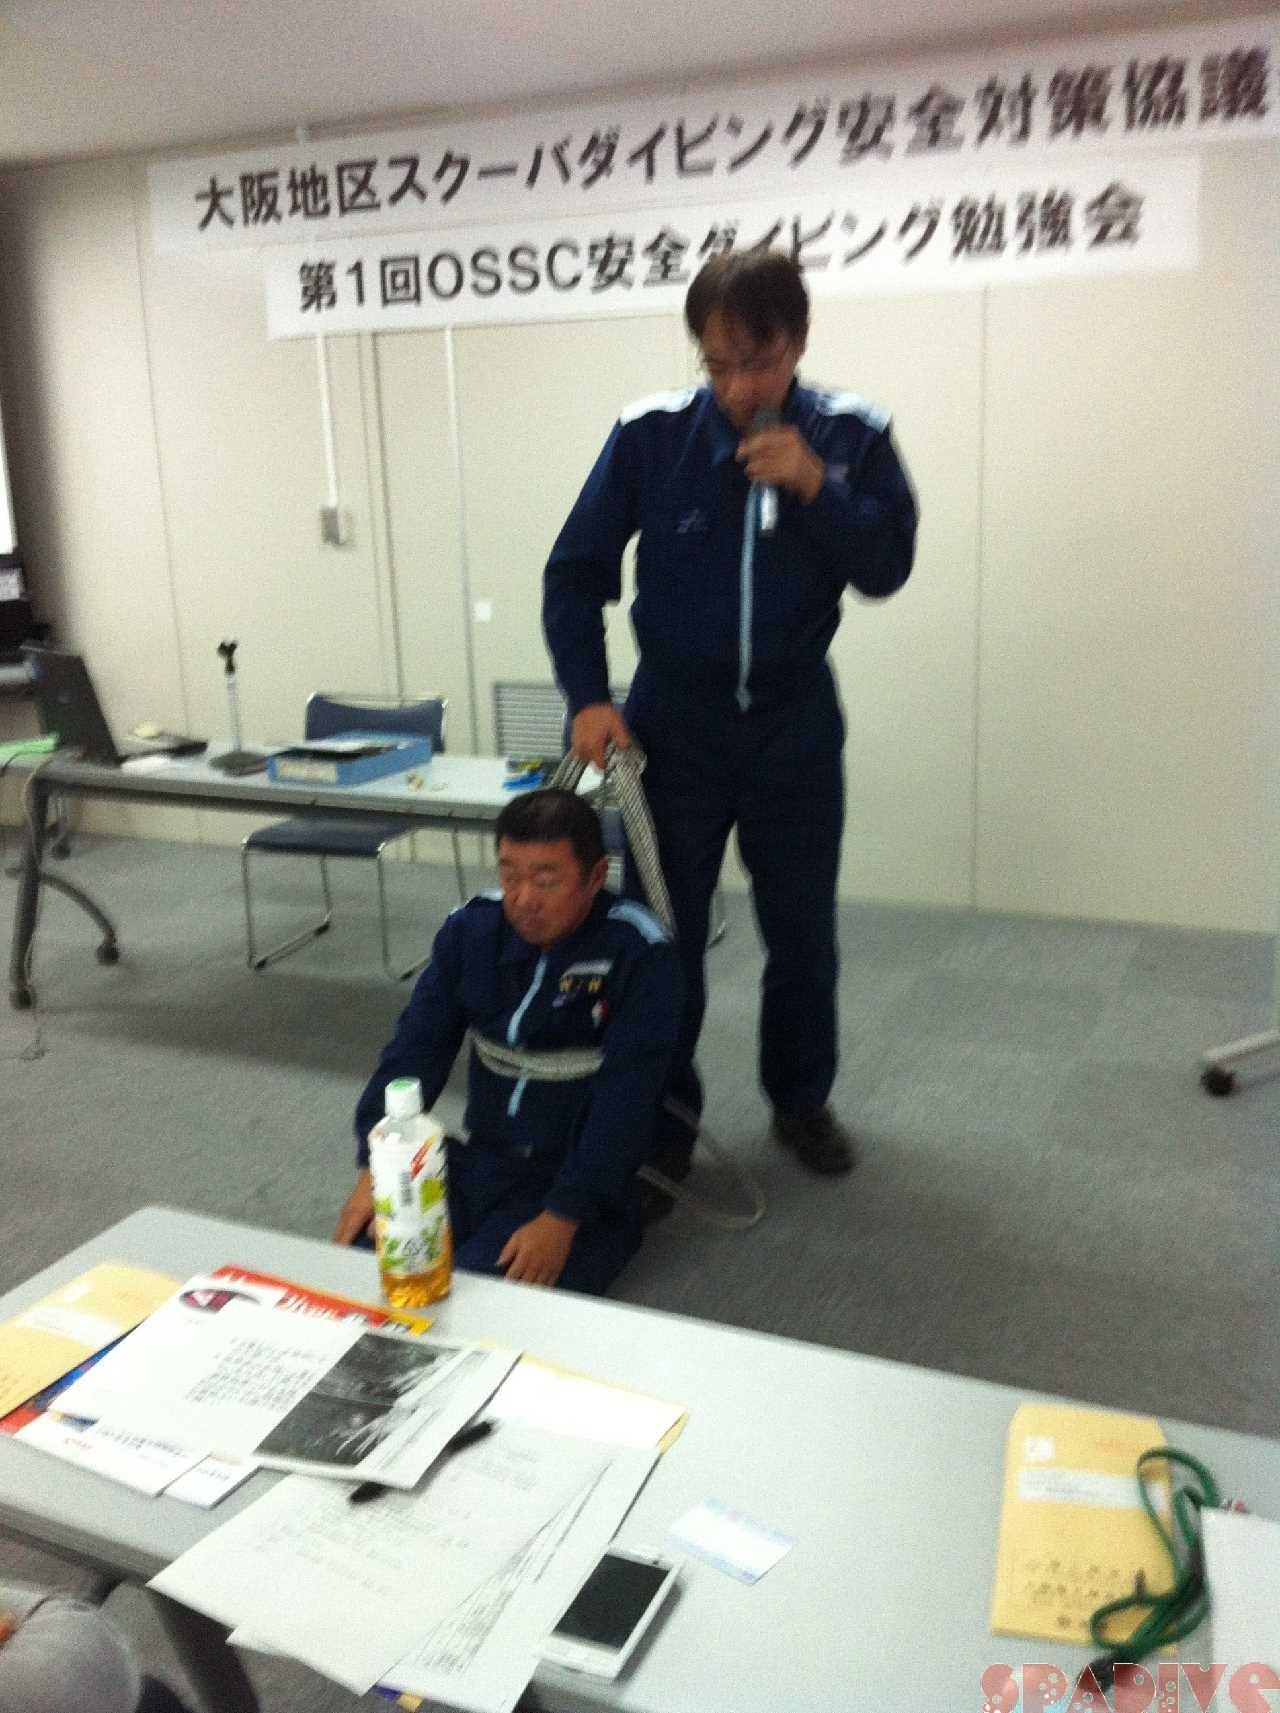 OSSC安全ダイビング勉強会で事故対策研究|DIVE BIZ SHOW 2012